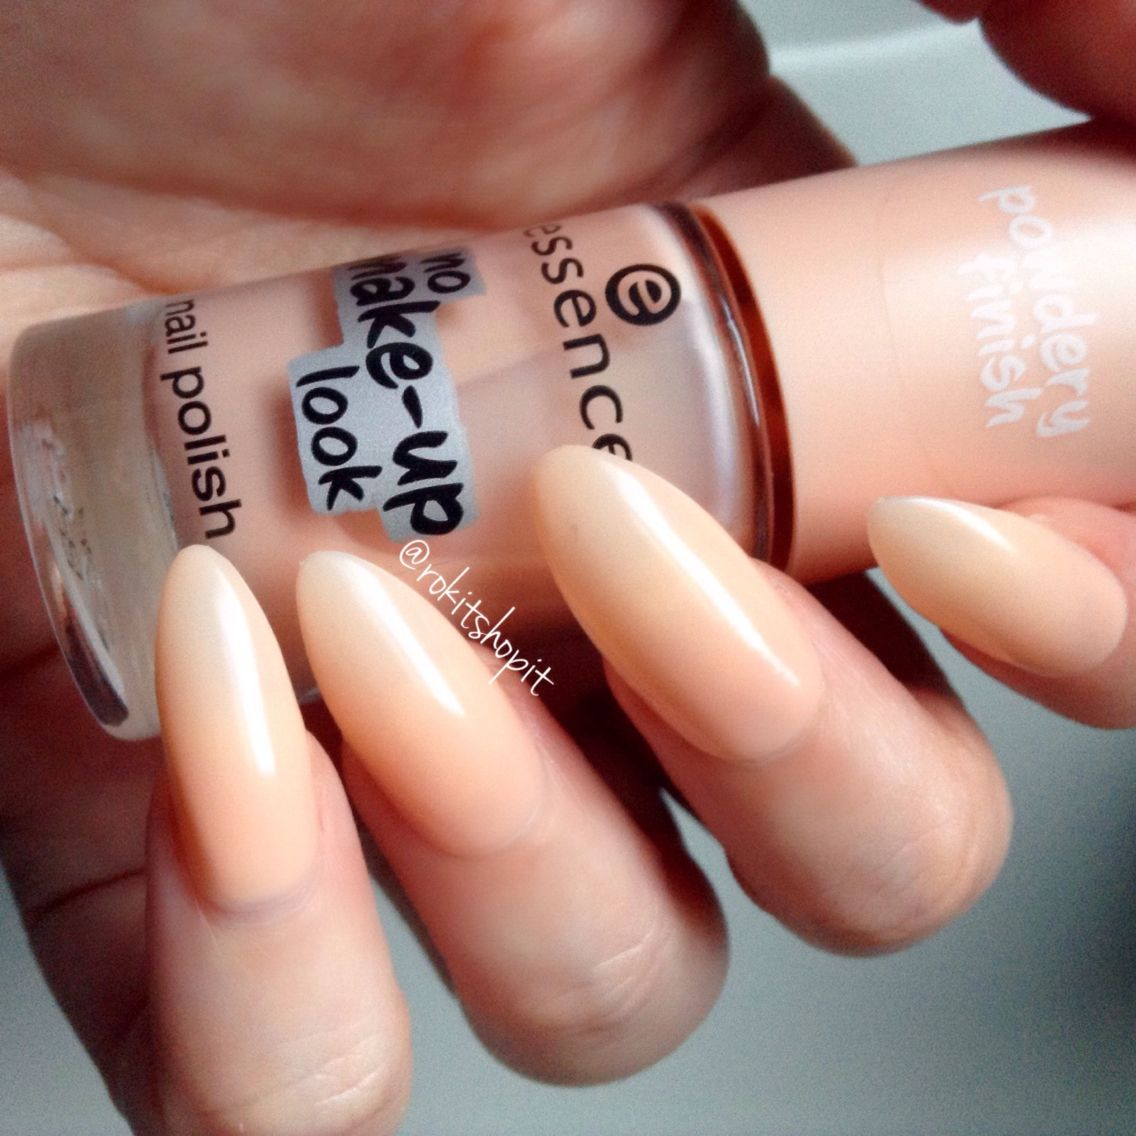 Essence Cosmetics no makeup look nude nails #nails #nailpolish ...